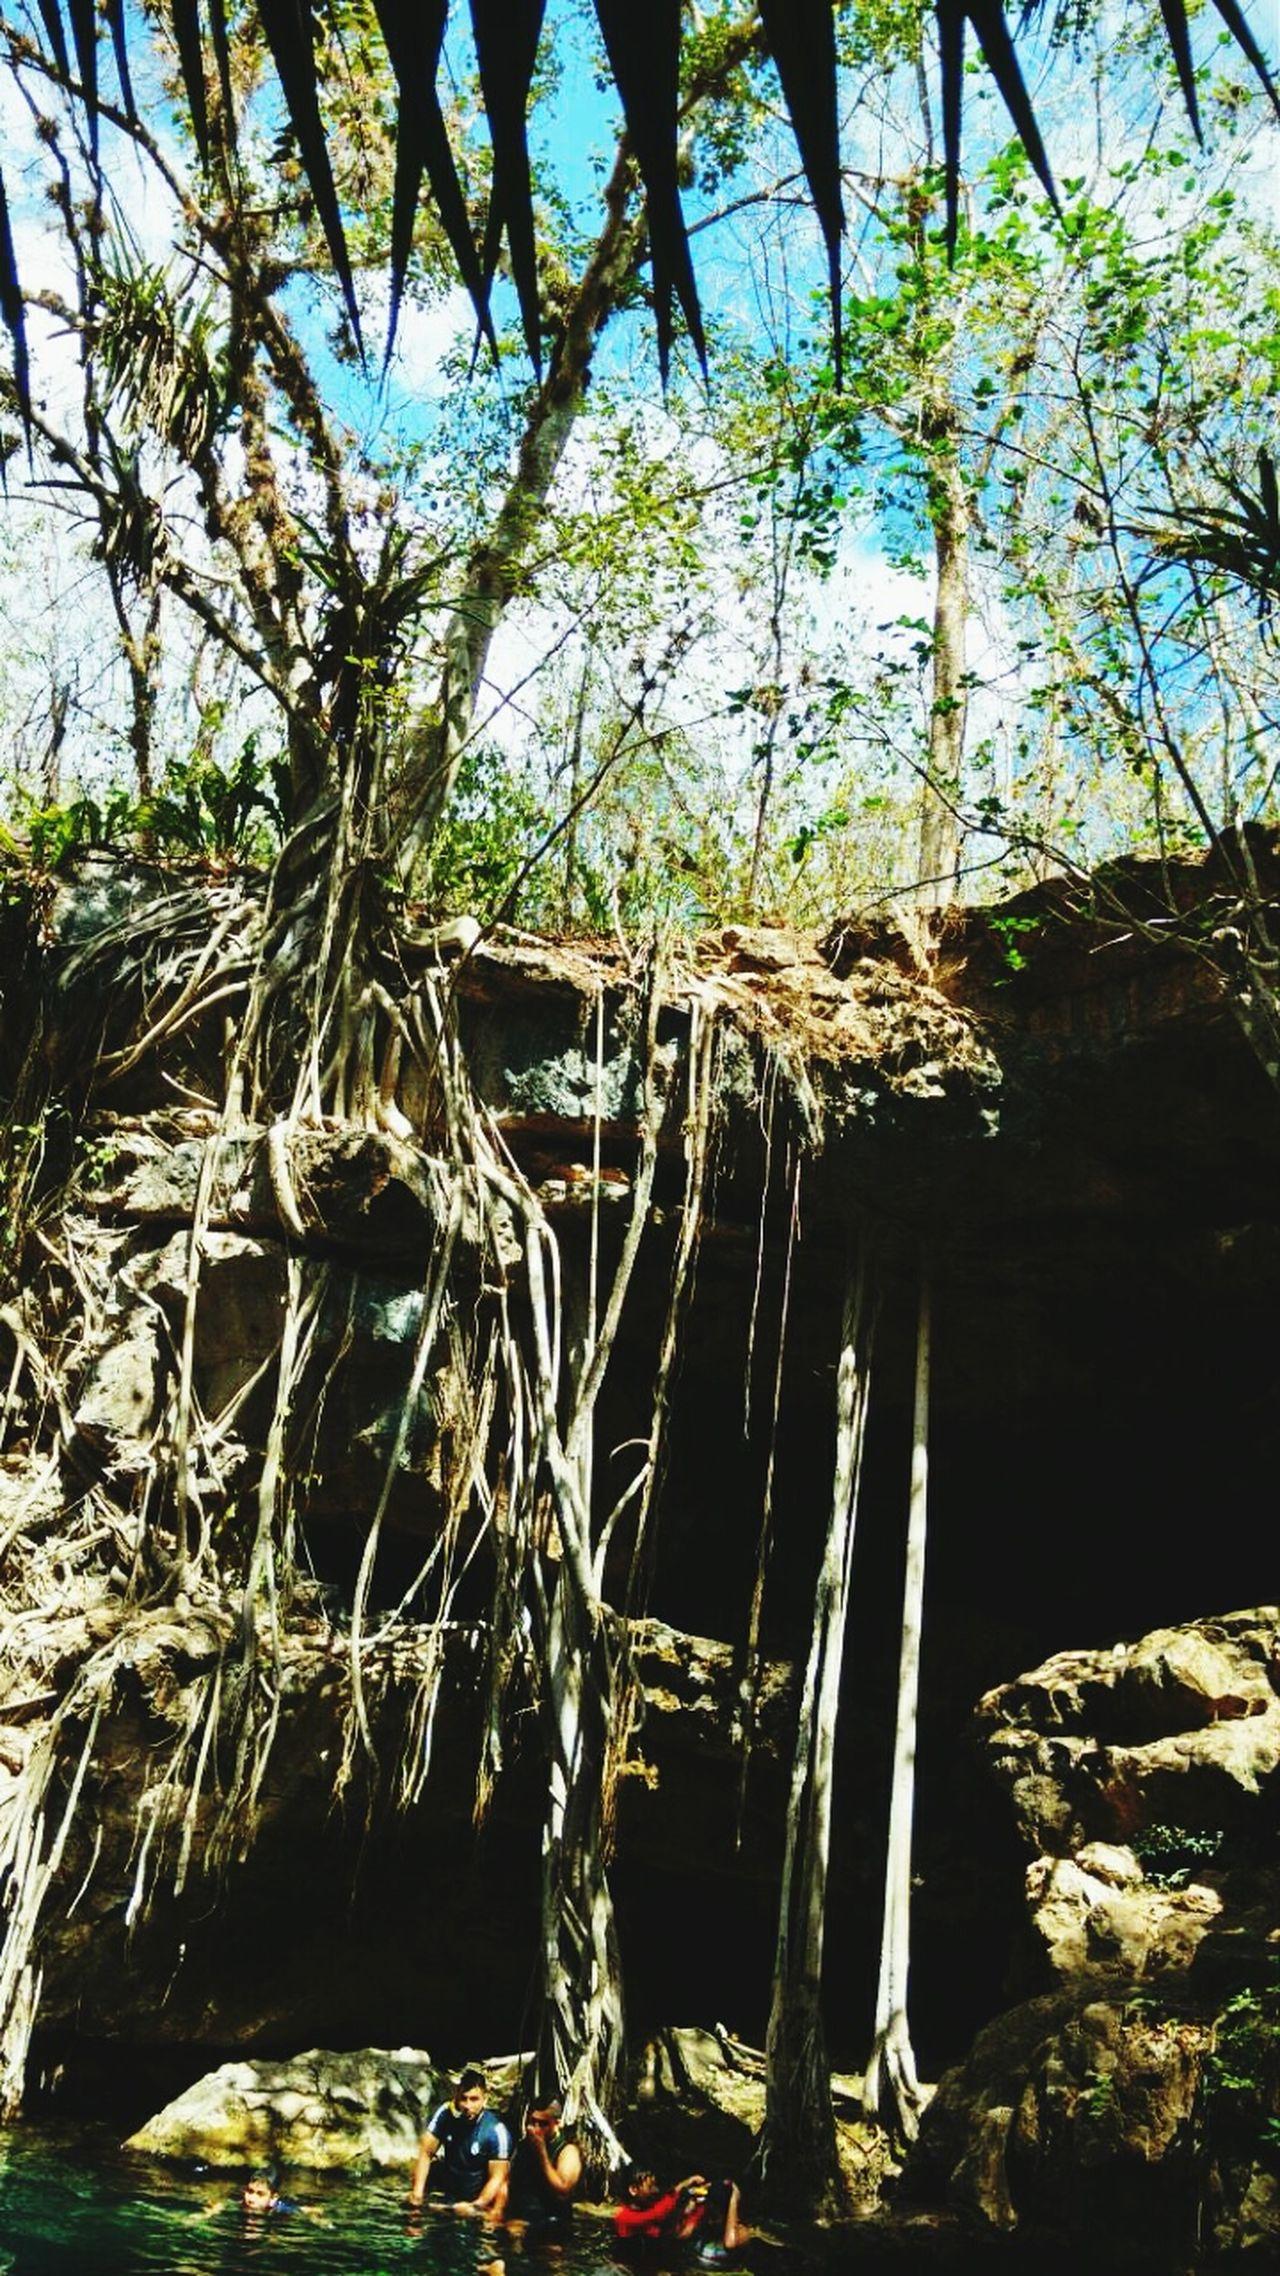 Nature Cenote Cabaña Arboles , Naturaleza Tranquility Beauty In Nature Yucatan Mexico Travel Destinations Sky Nature_collection